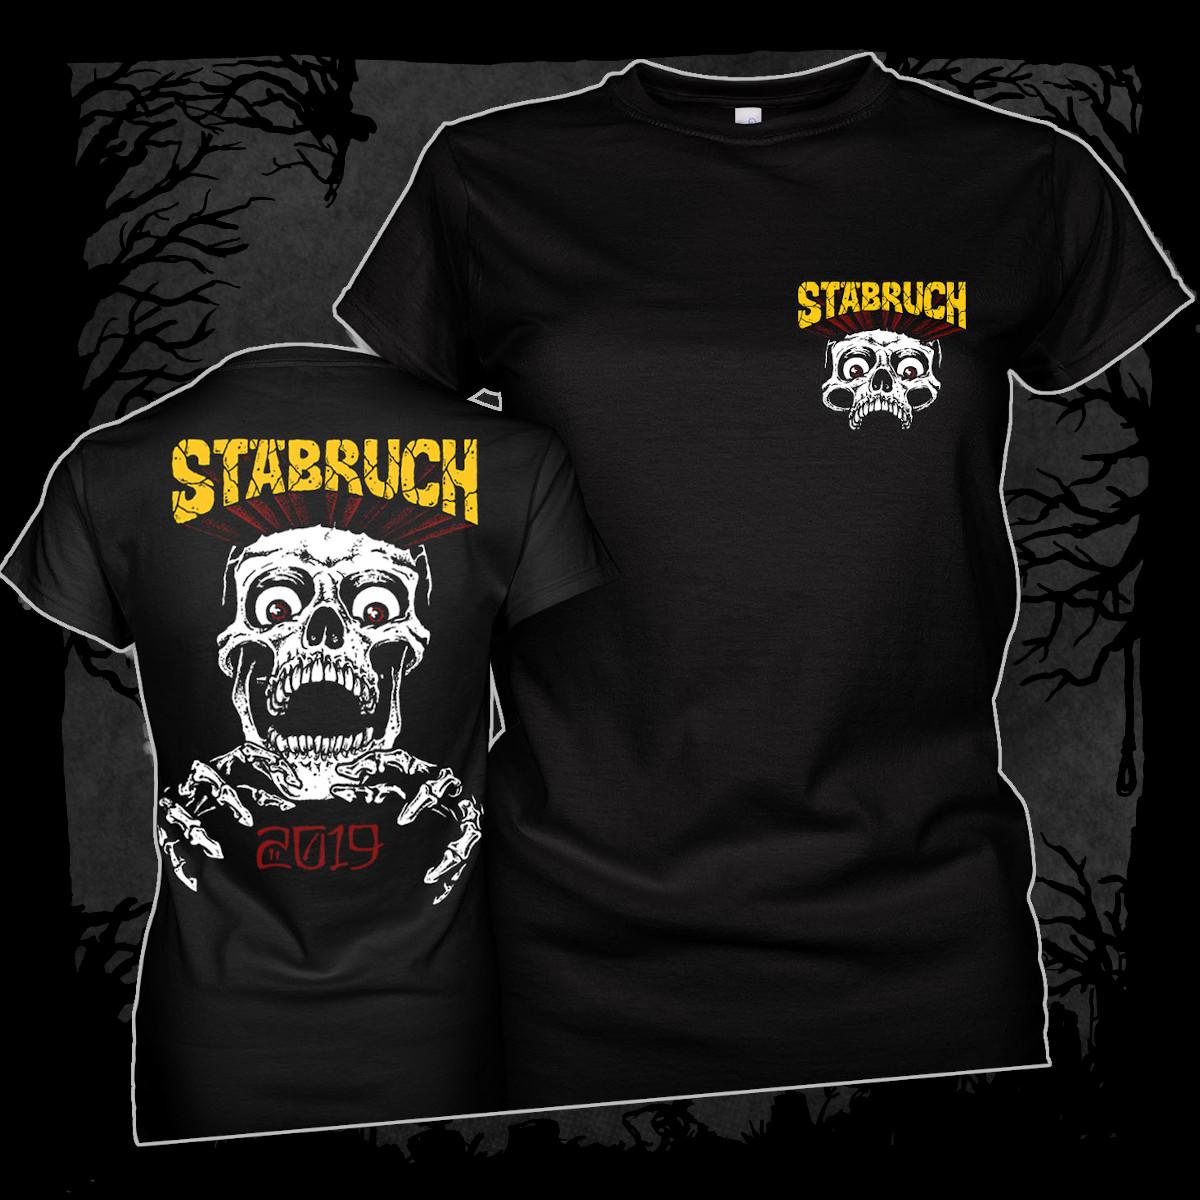 Stäbruch - 2019 [Girlie T-Shirt] (Farbe schwarz, Two-Sided-Print: weiß, gelb, rot)